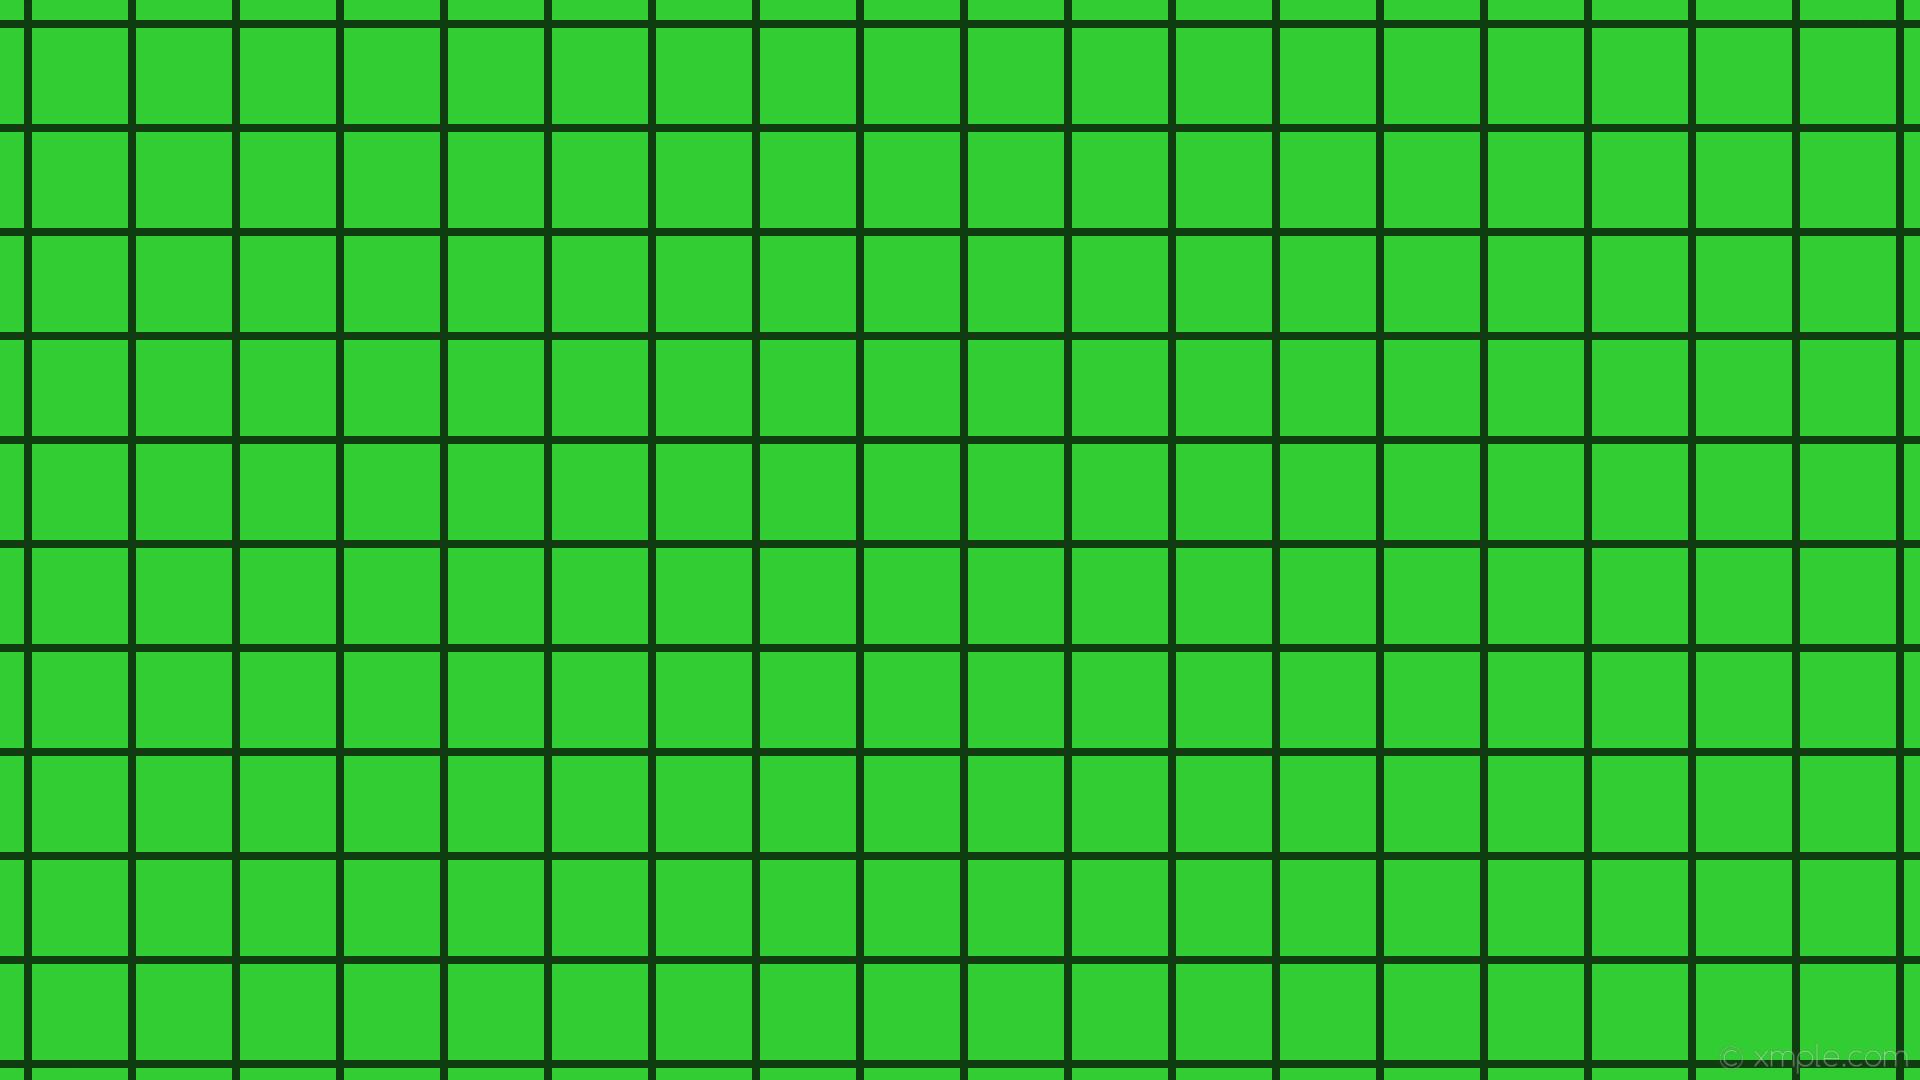 wallpaper black green grid graph paper lime green #32cd32 #000000 0° 8px  104px